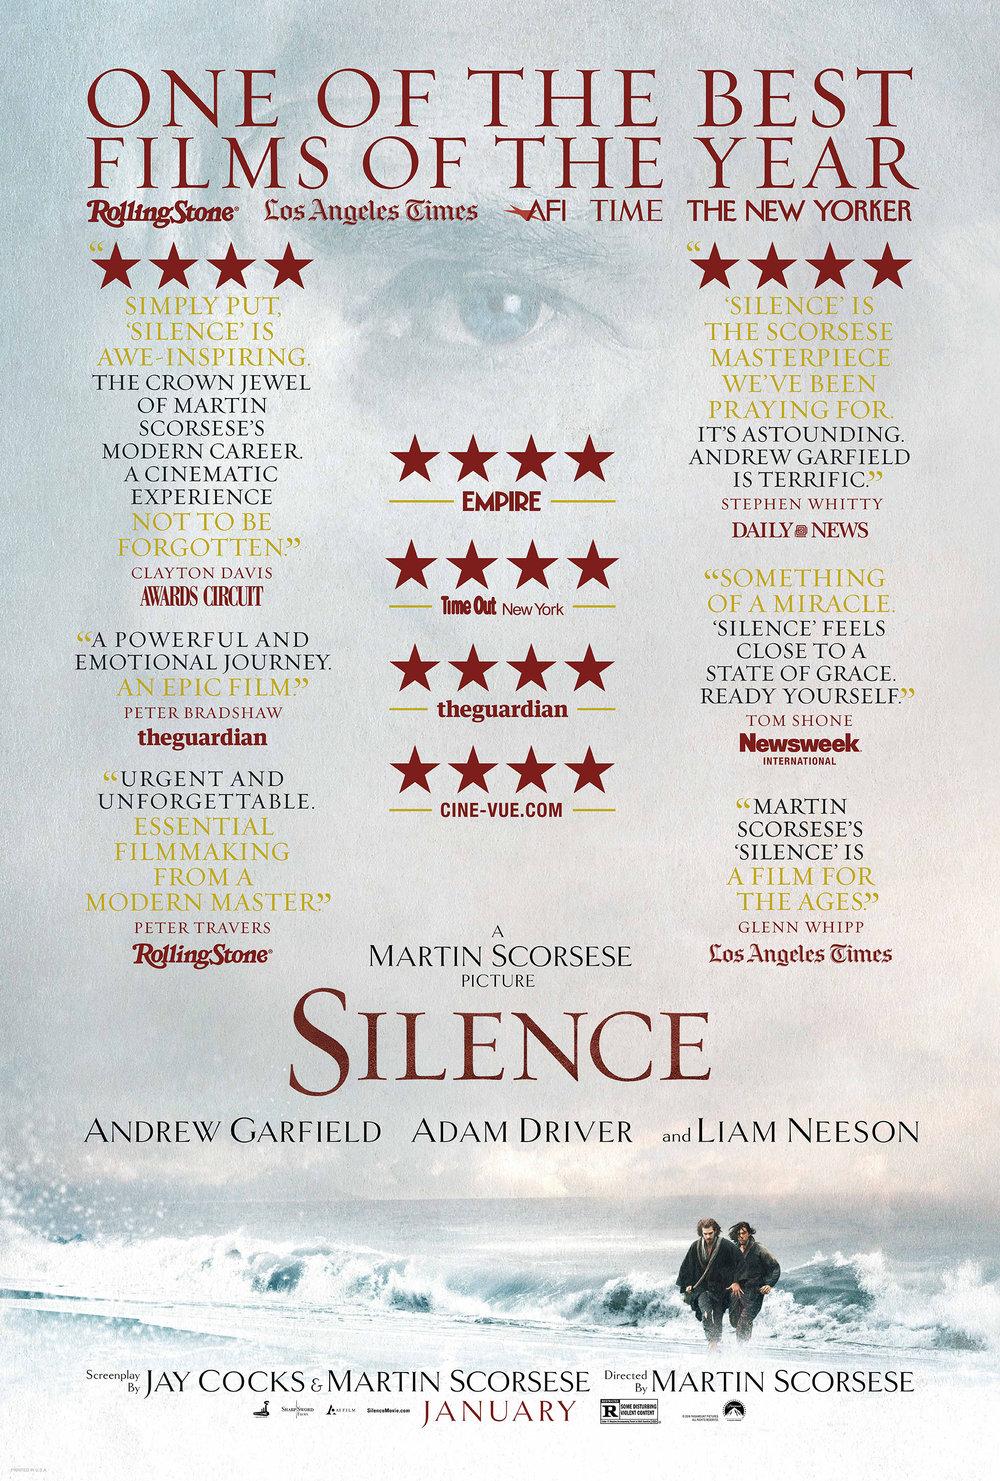 SILENCE_DOM_REVIEW_1-SHT_27X40_6cd46eeef2b44d60e53ed1c9de4fddabfc26e973.jpg